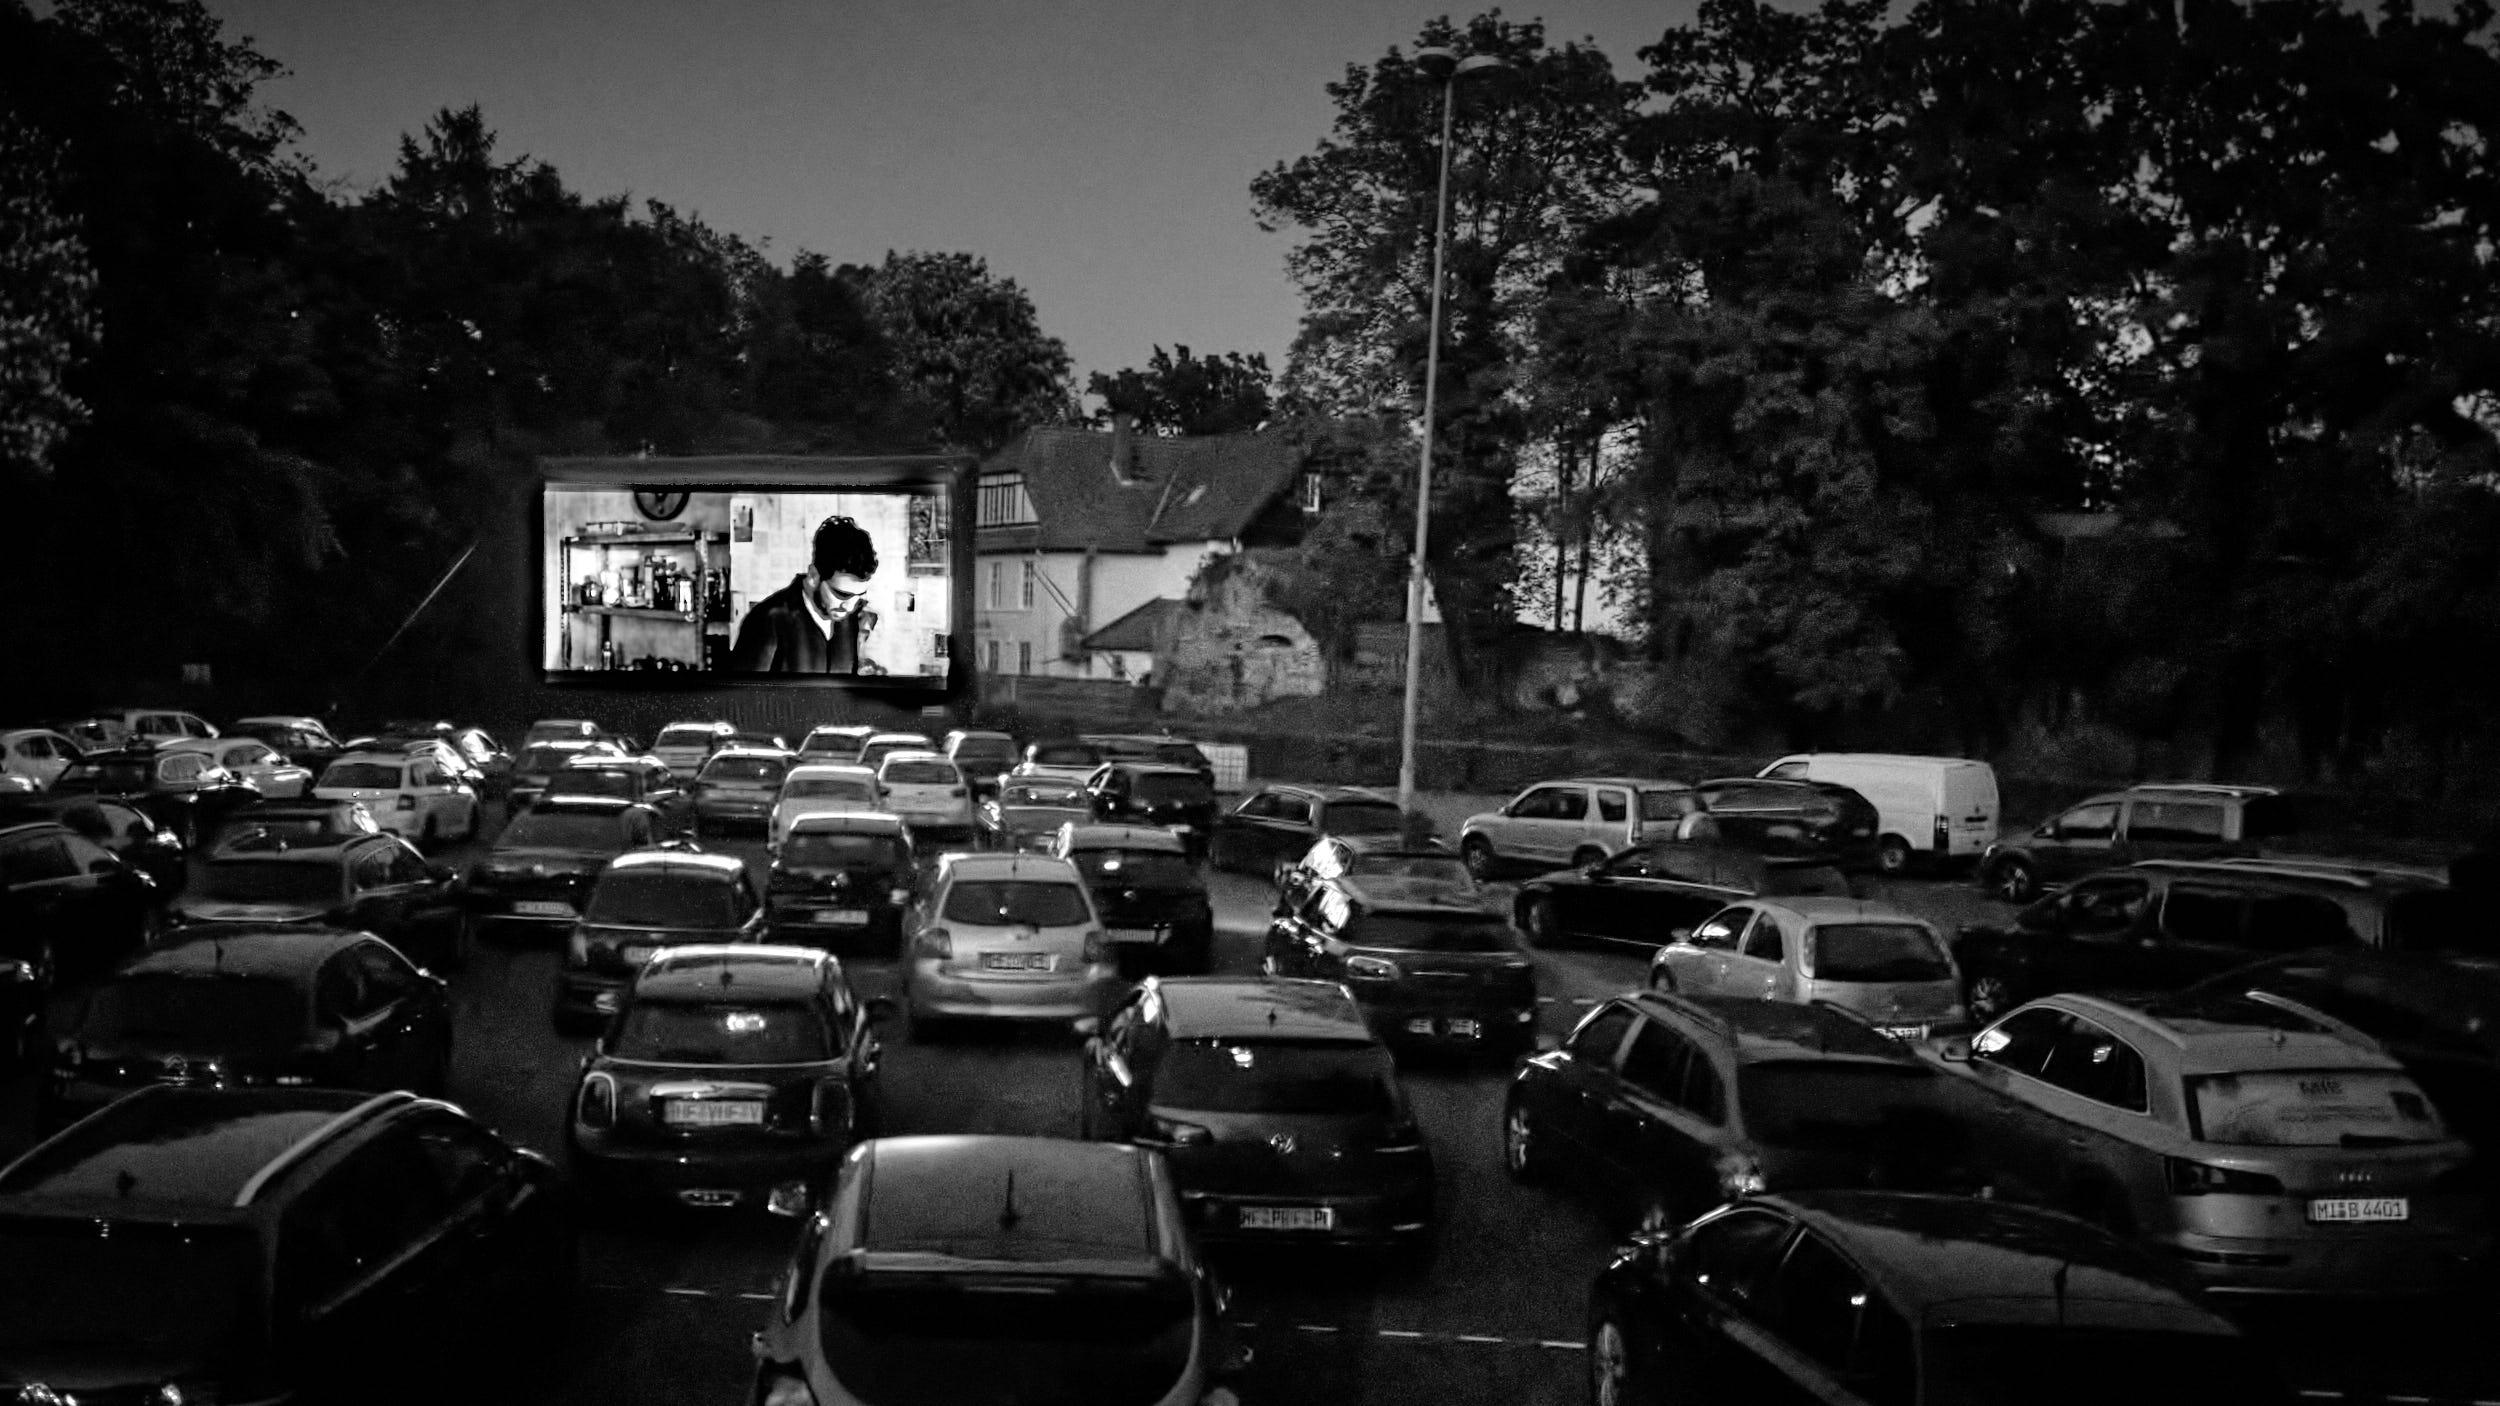 Nacht beim Autokino Vlotho Burg 2020